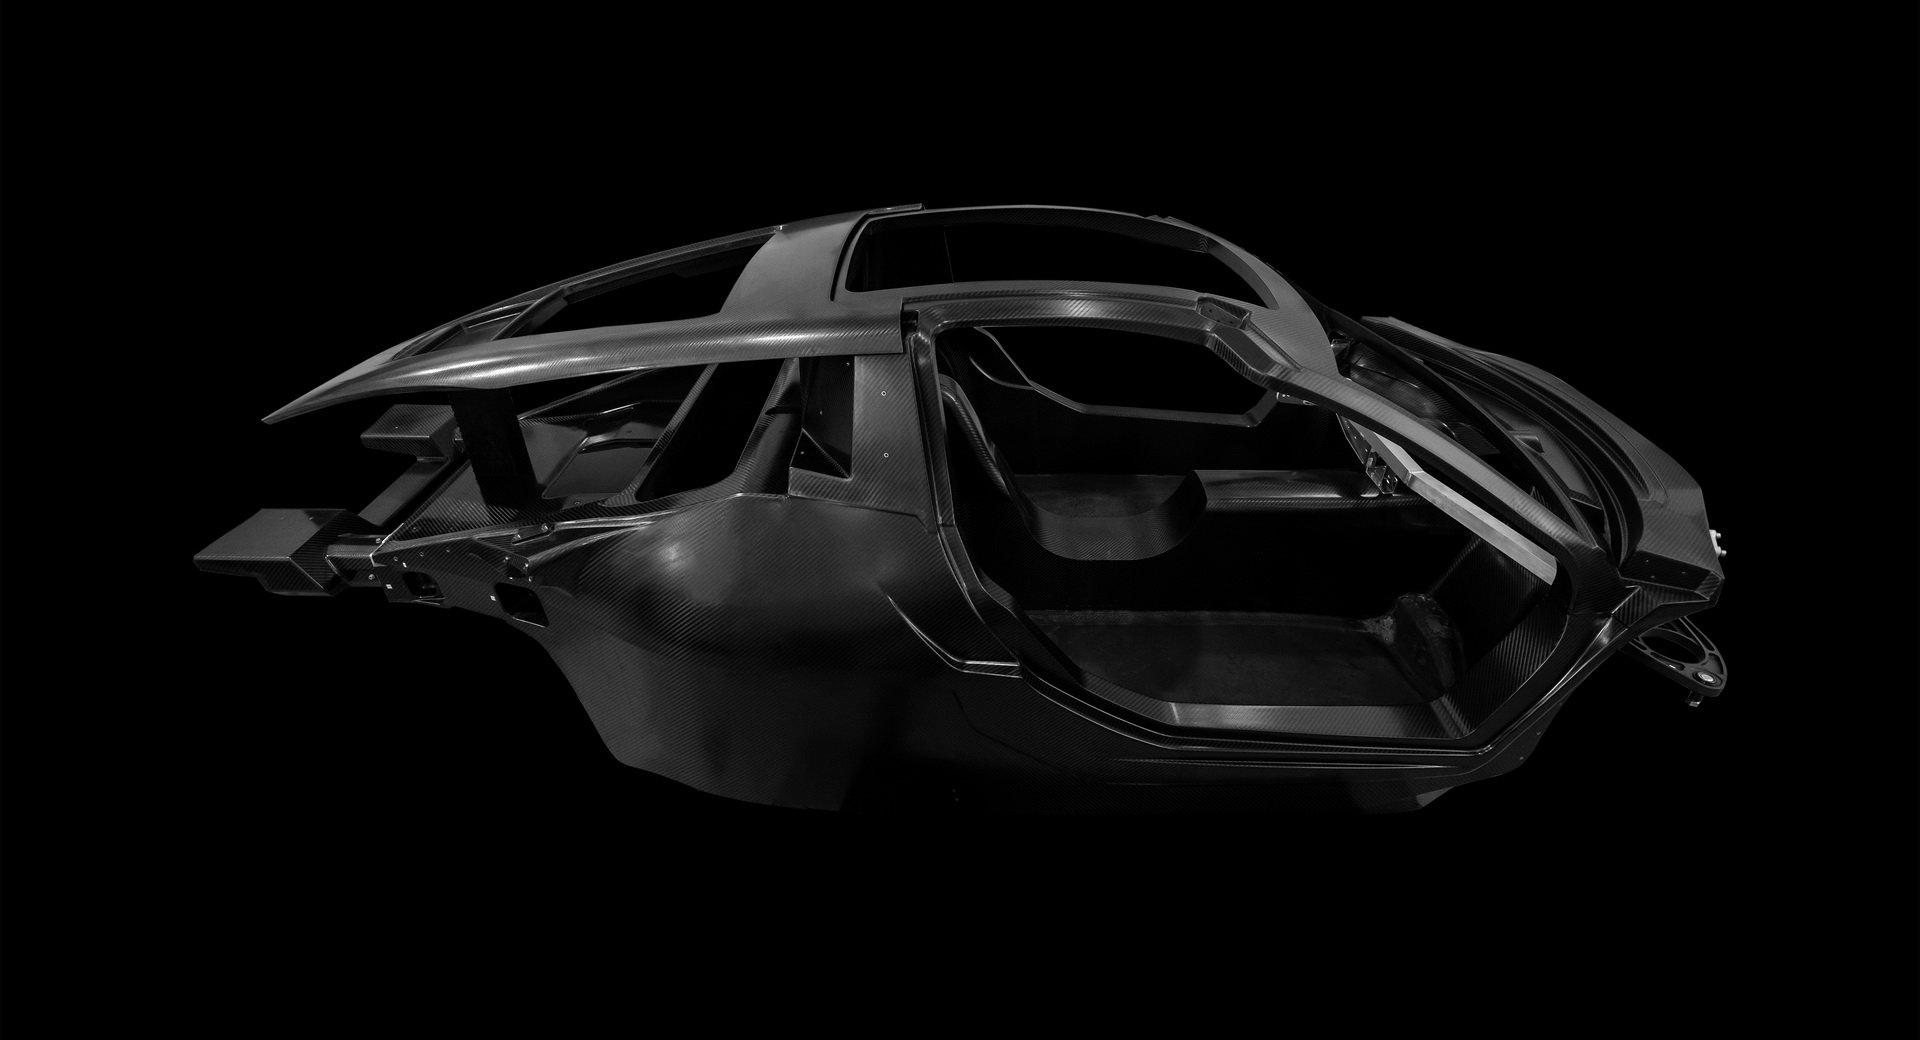 42c54cc1-hispano-suiza-carmen-carbon-chassis